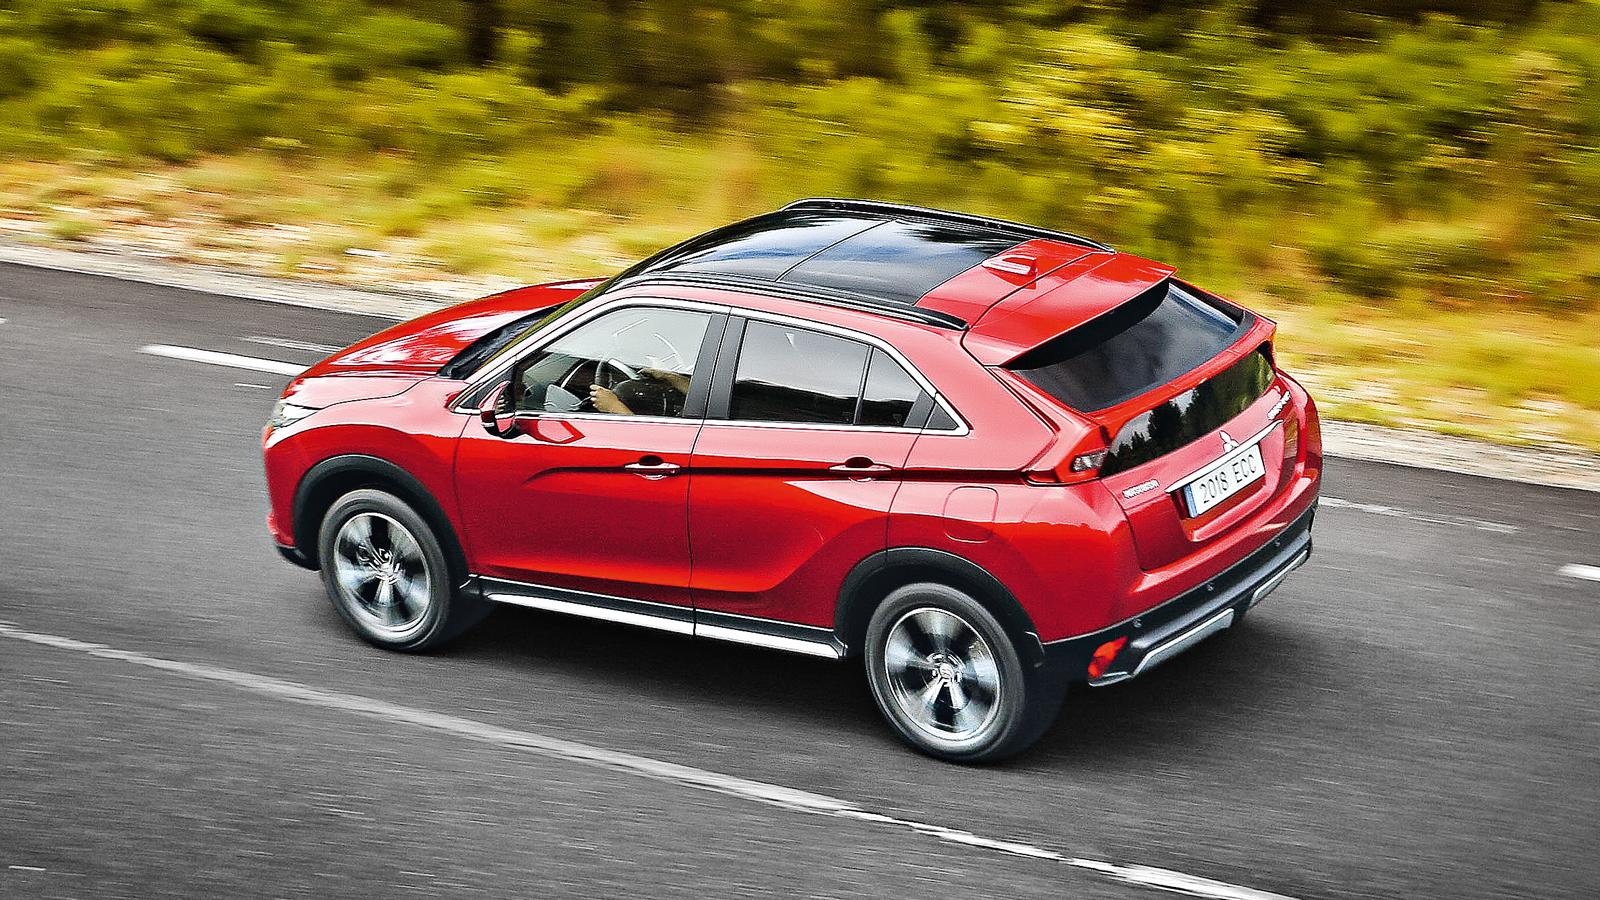 Novo Mitsubishi tem porte de Jeep Compass